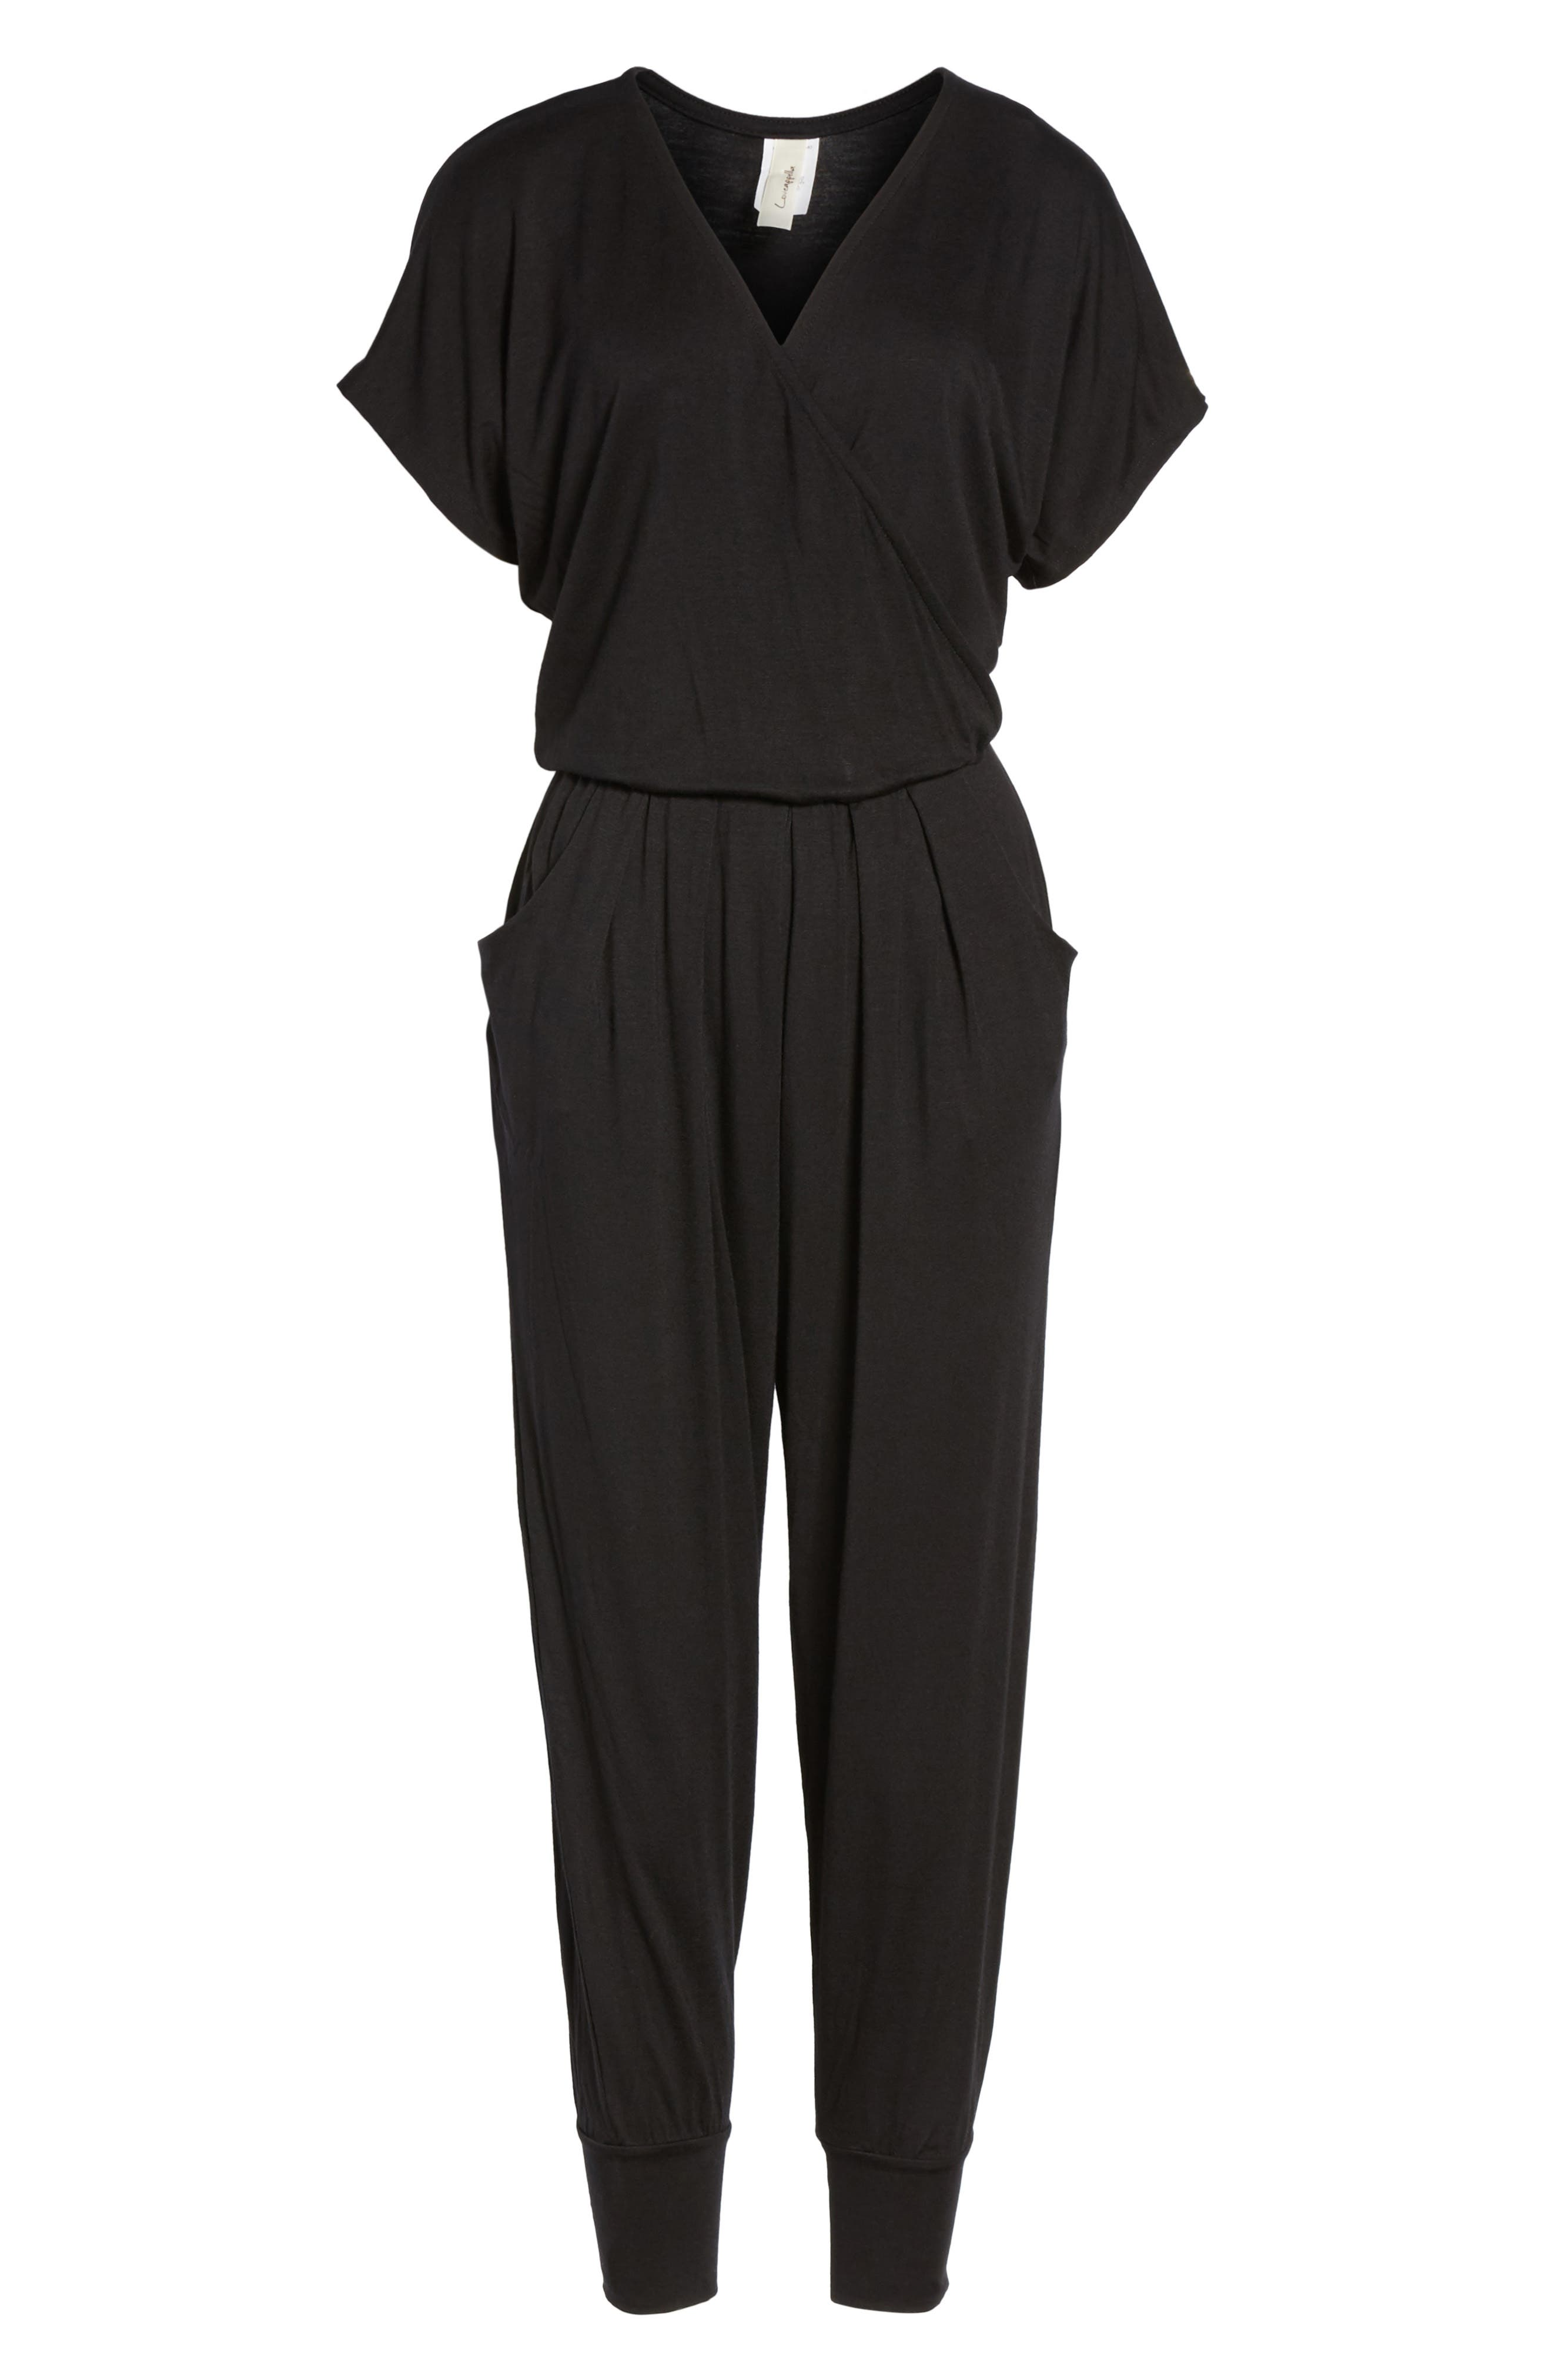 LOVEAPPELLA, Short Sleeve Wrap Top Jumpsuit, Main thumbnail 1, color, BLACK